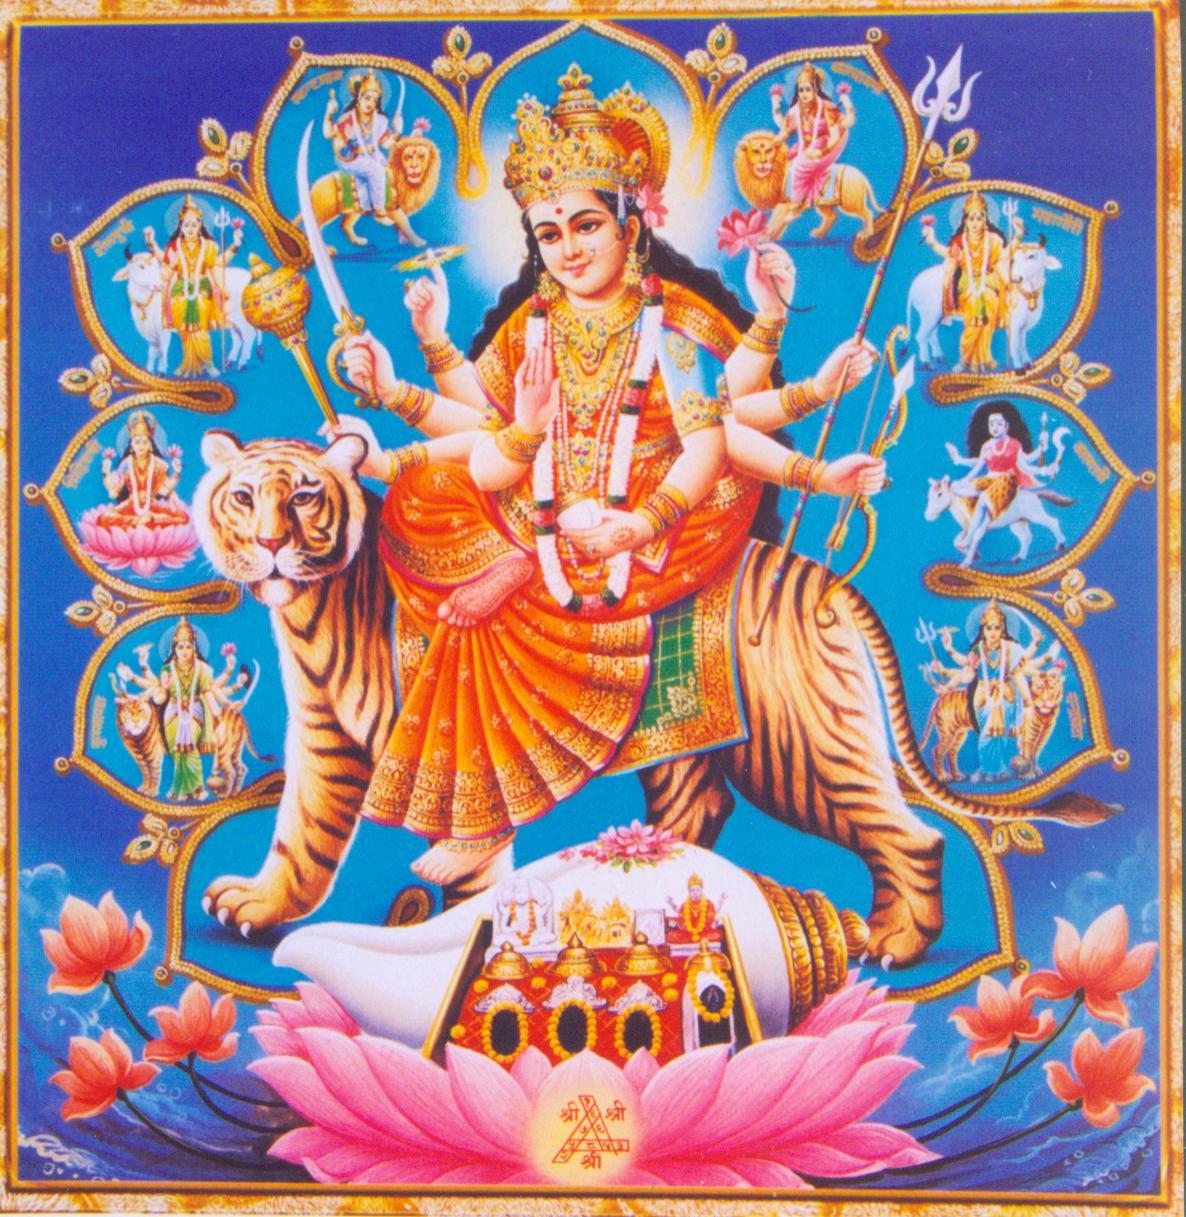 Krishna 3d Wallpaper For Mobile Hindu God Wallpapers Hindu Goddess Durga Wallpapers